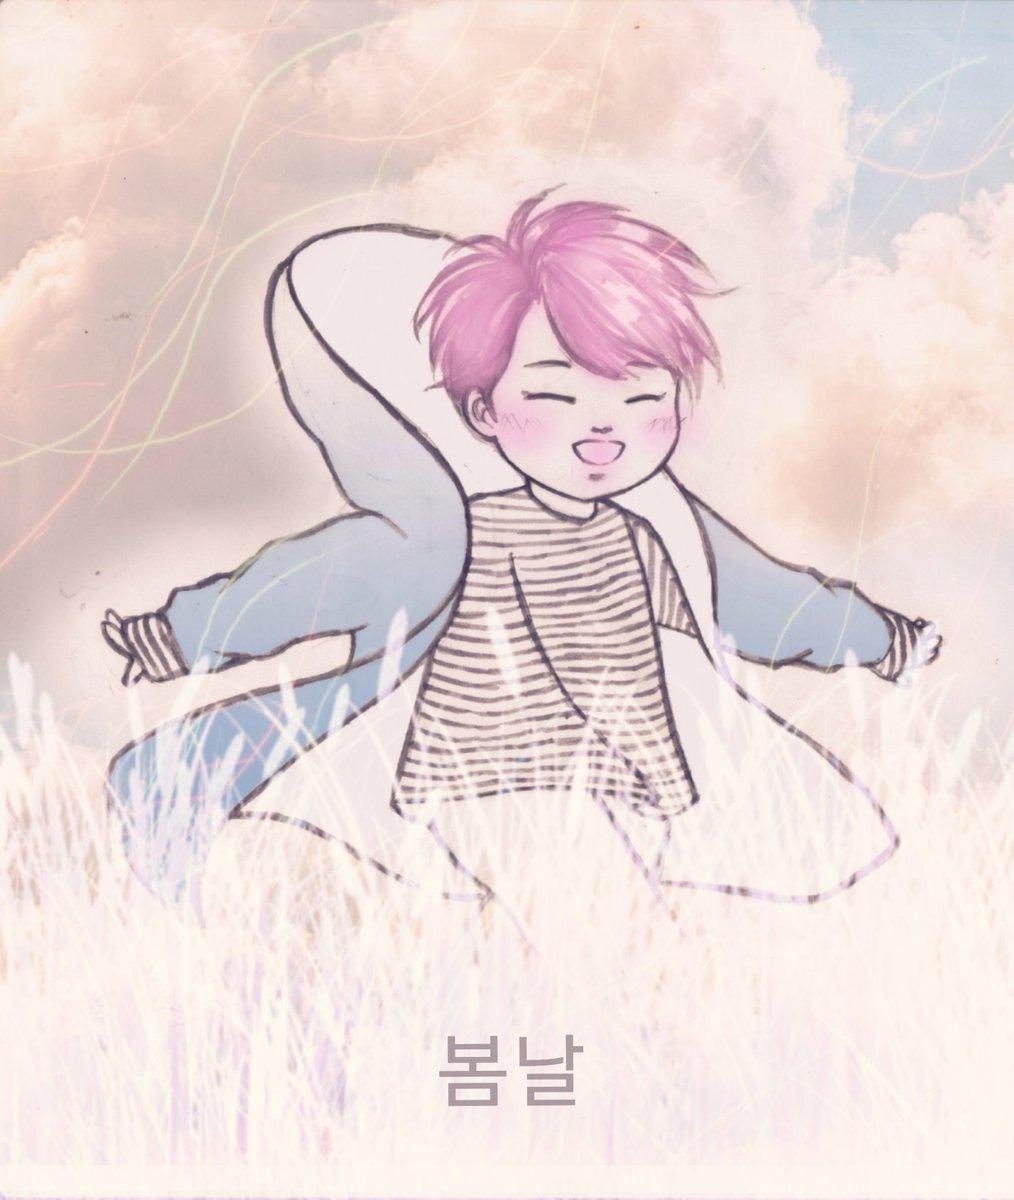 I&#39;m missing you @BTS_twt  #BBMAs  #BBMAsTopSocial and BTS #BTS #btsfanart #JIMIN #박지민 #지민 #봄날 #TimelessSpringDay <br>http://pic.twitter.com/ljFgs9MhTa